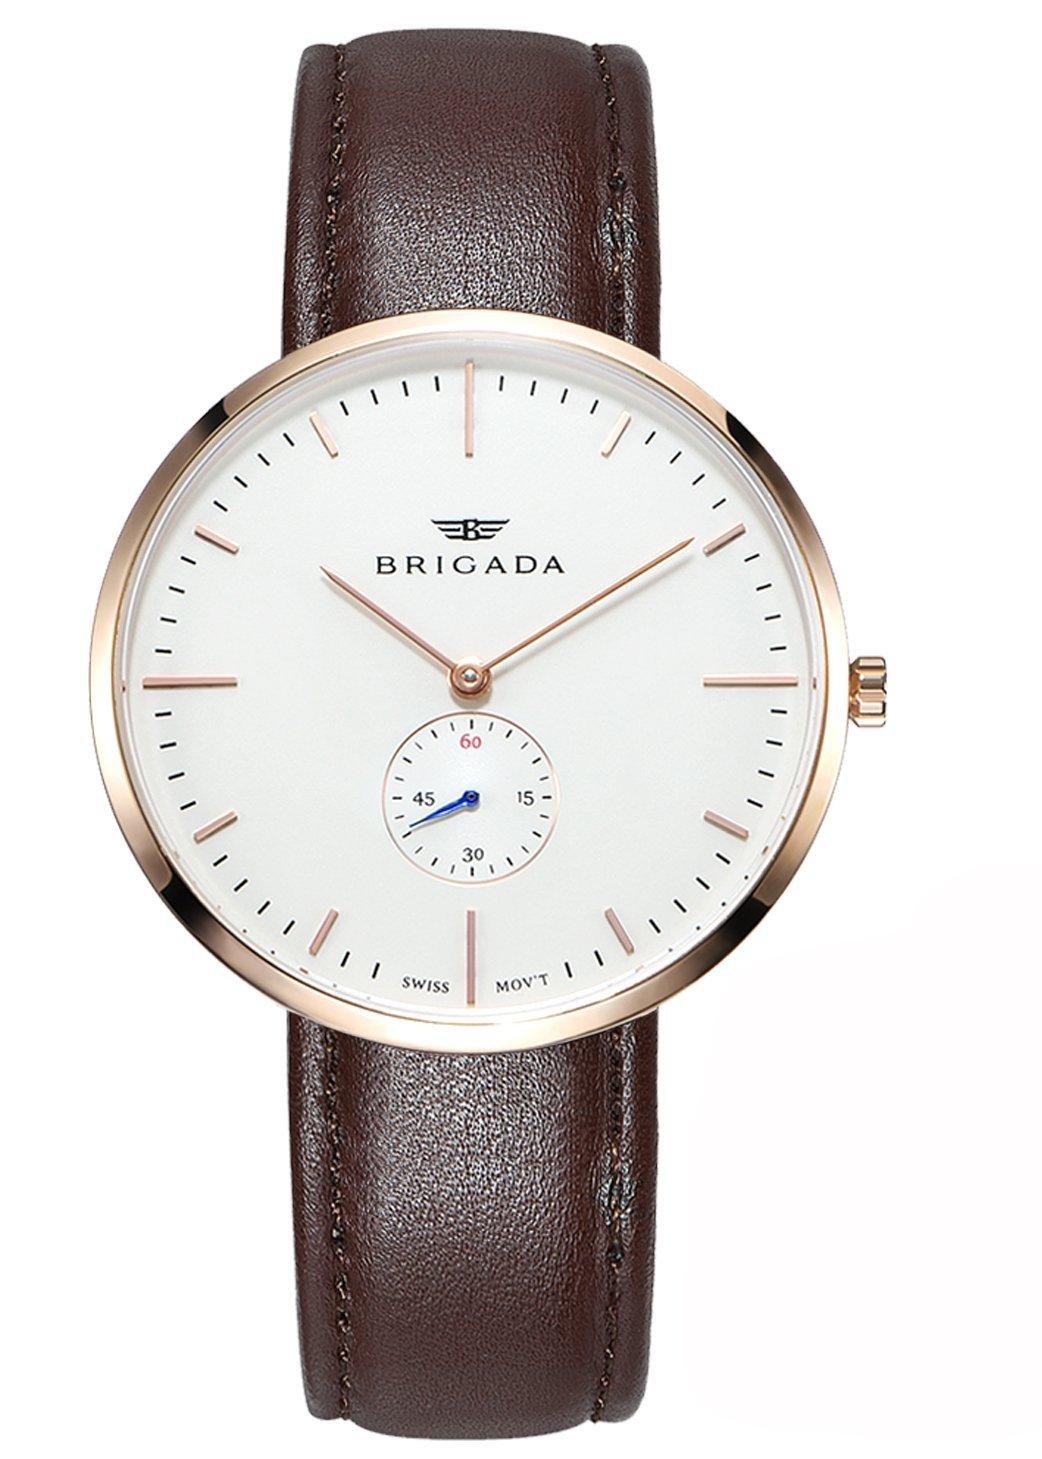 Swiss Brand Nice Fashion Men's Dress Watch Waterproof, Rose Gold Case Swiss Movement Business Casual Men's Wrist Watch